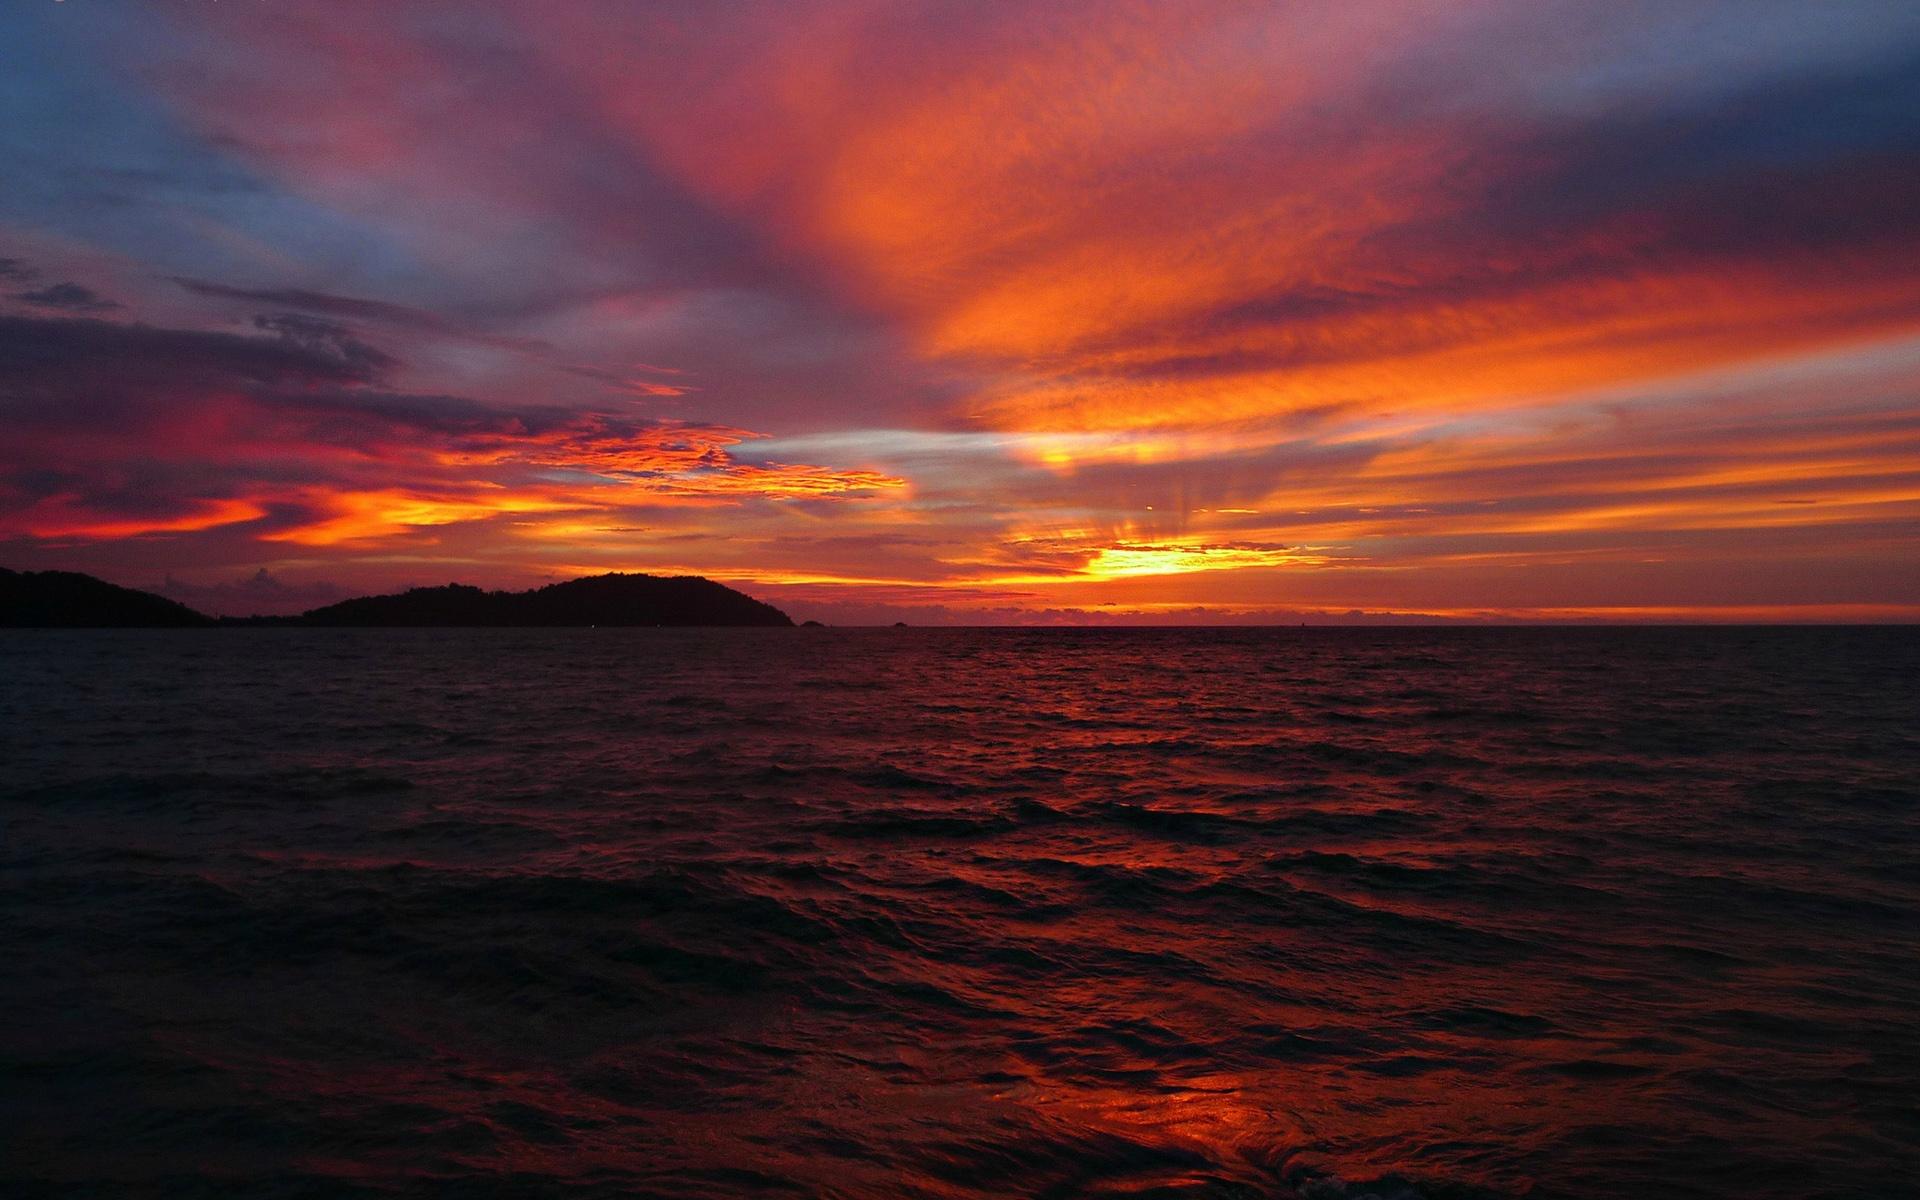 Wallpaper Sea Sky Clouds Horizon Sun Sunset Red Style